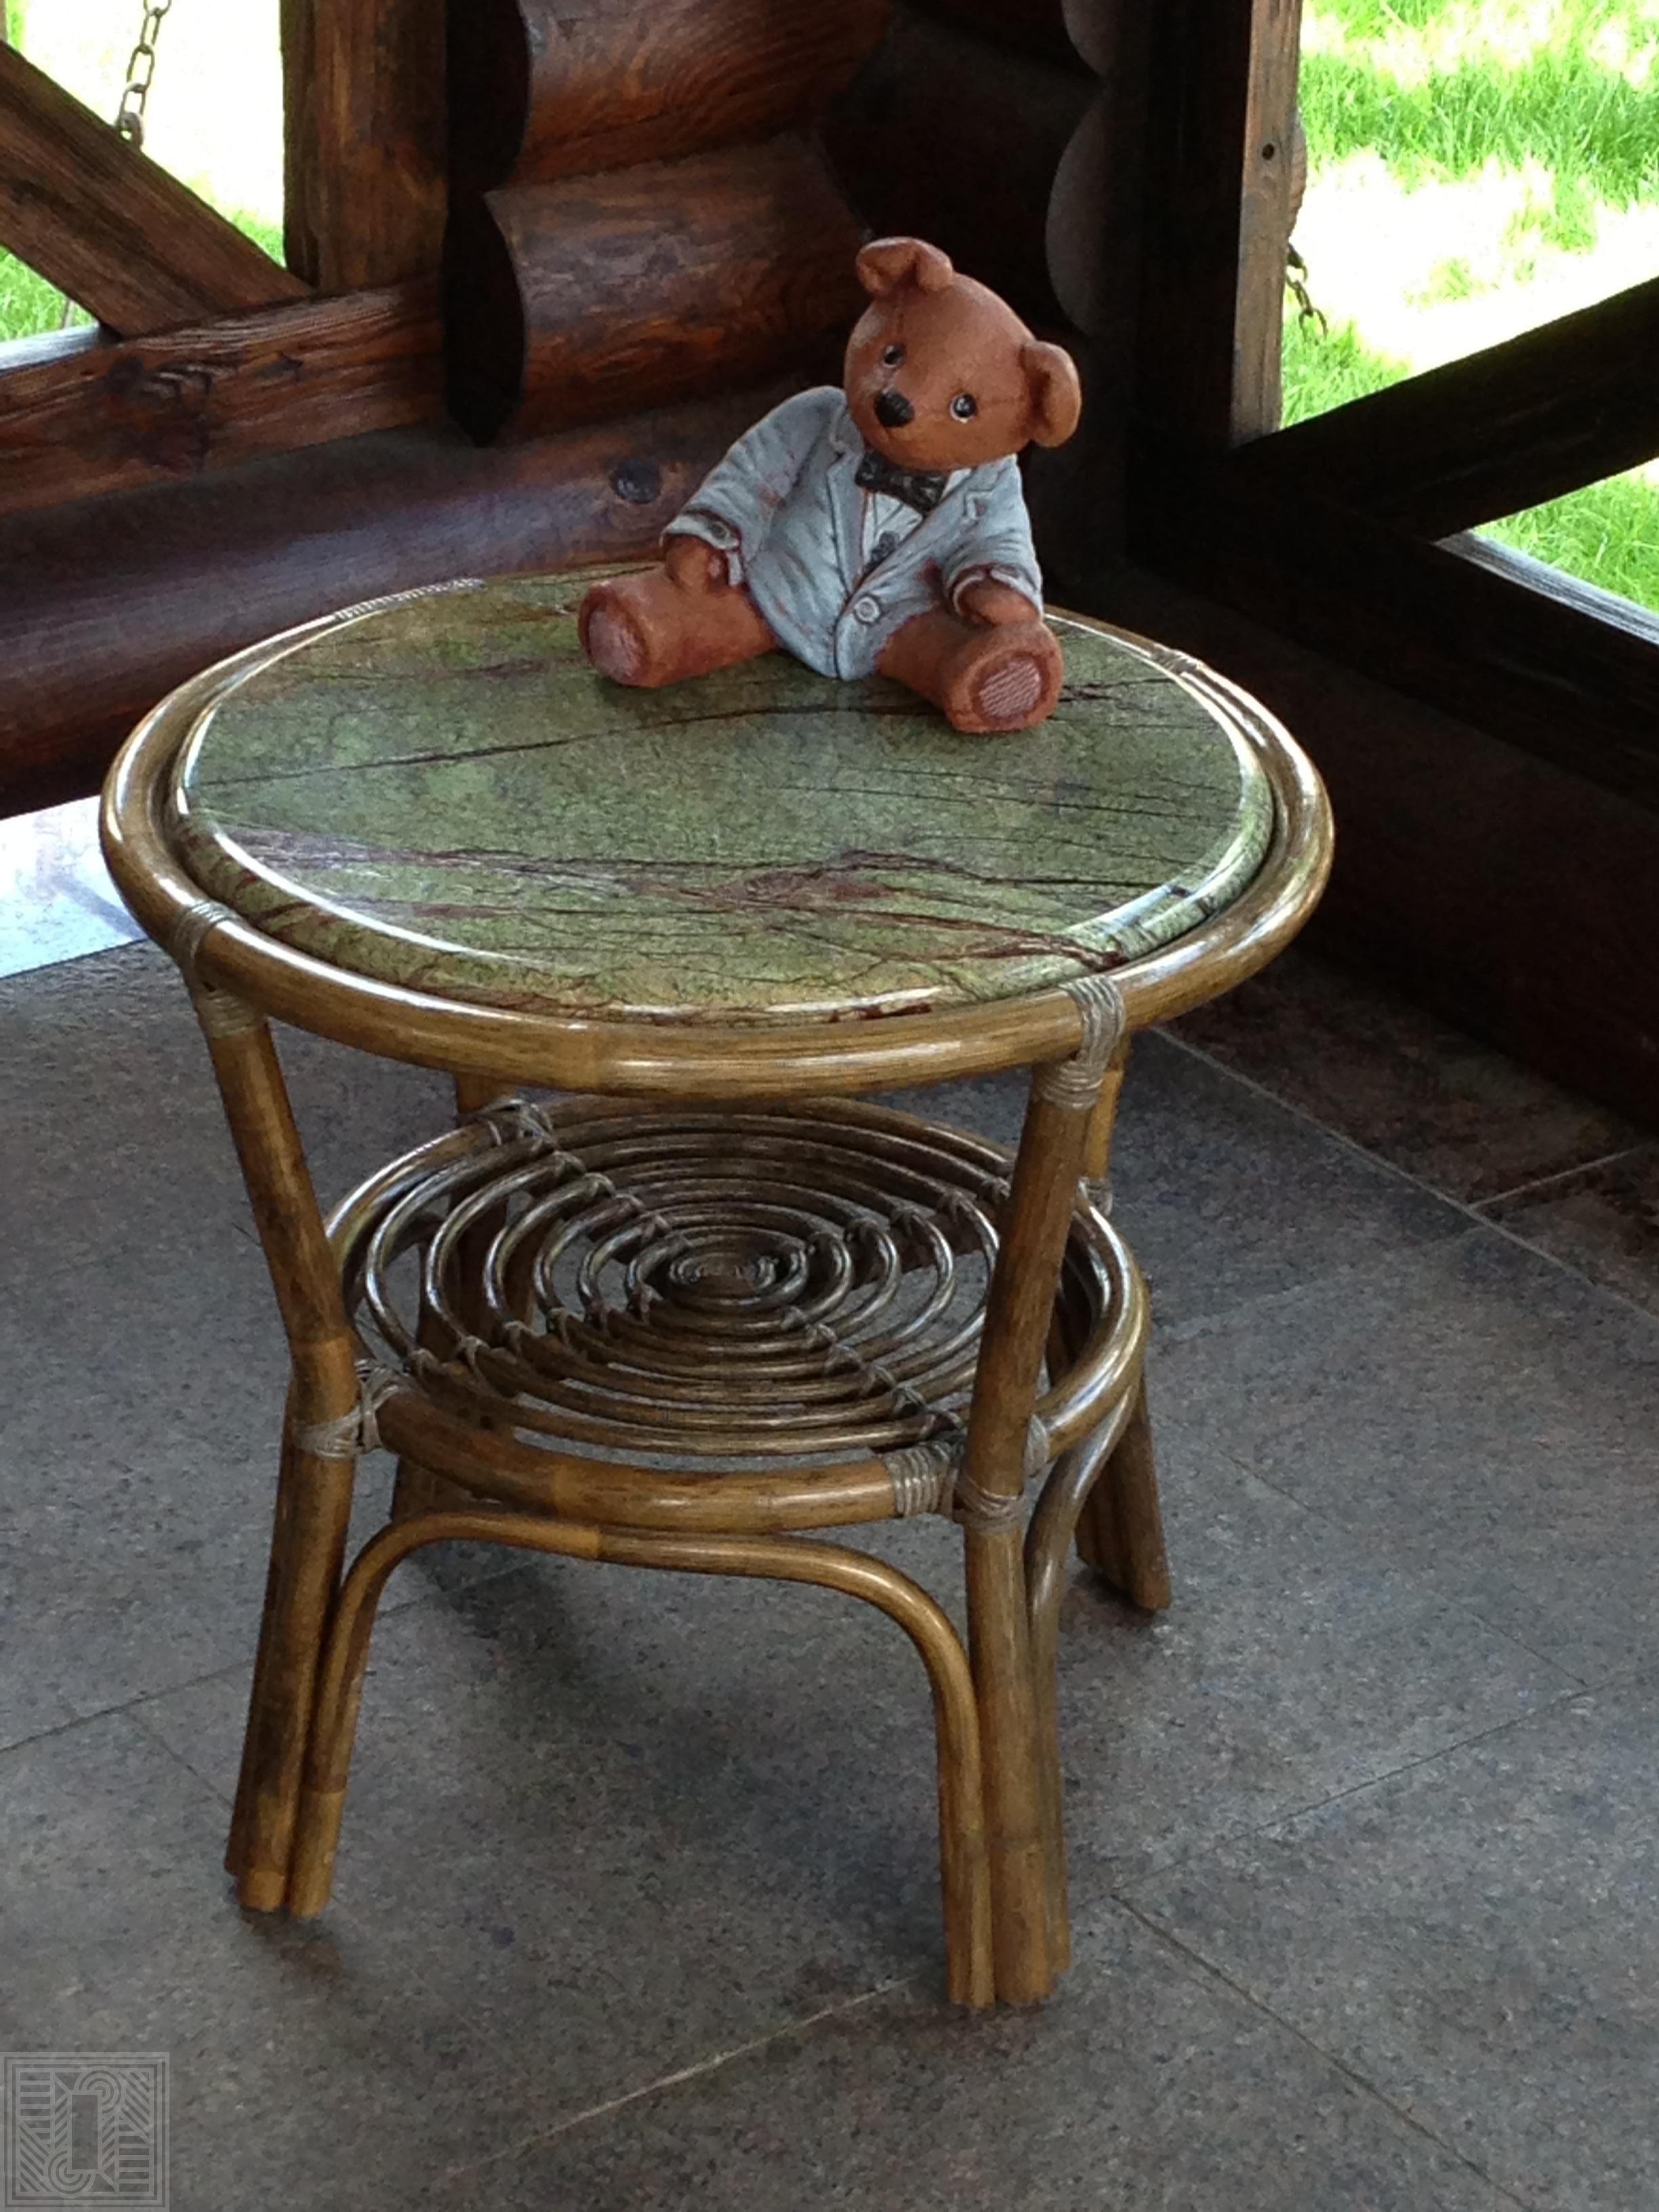 Столик из мрамора Rein Forest Green furniture - Stolik iz mramora Rein Forest Green e1547119559342